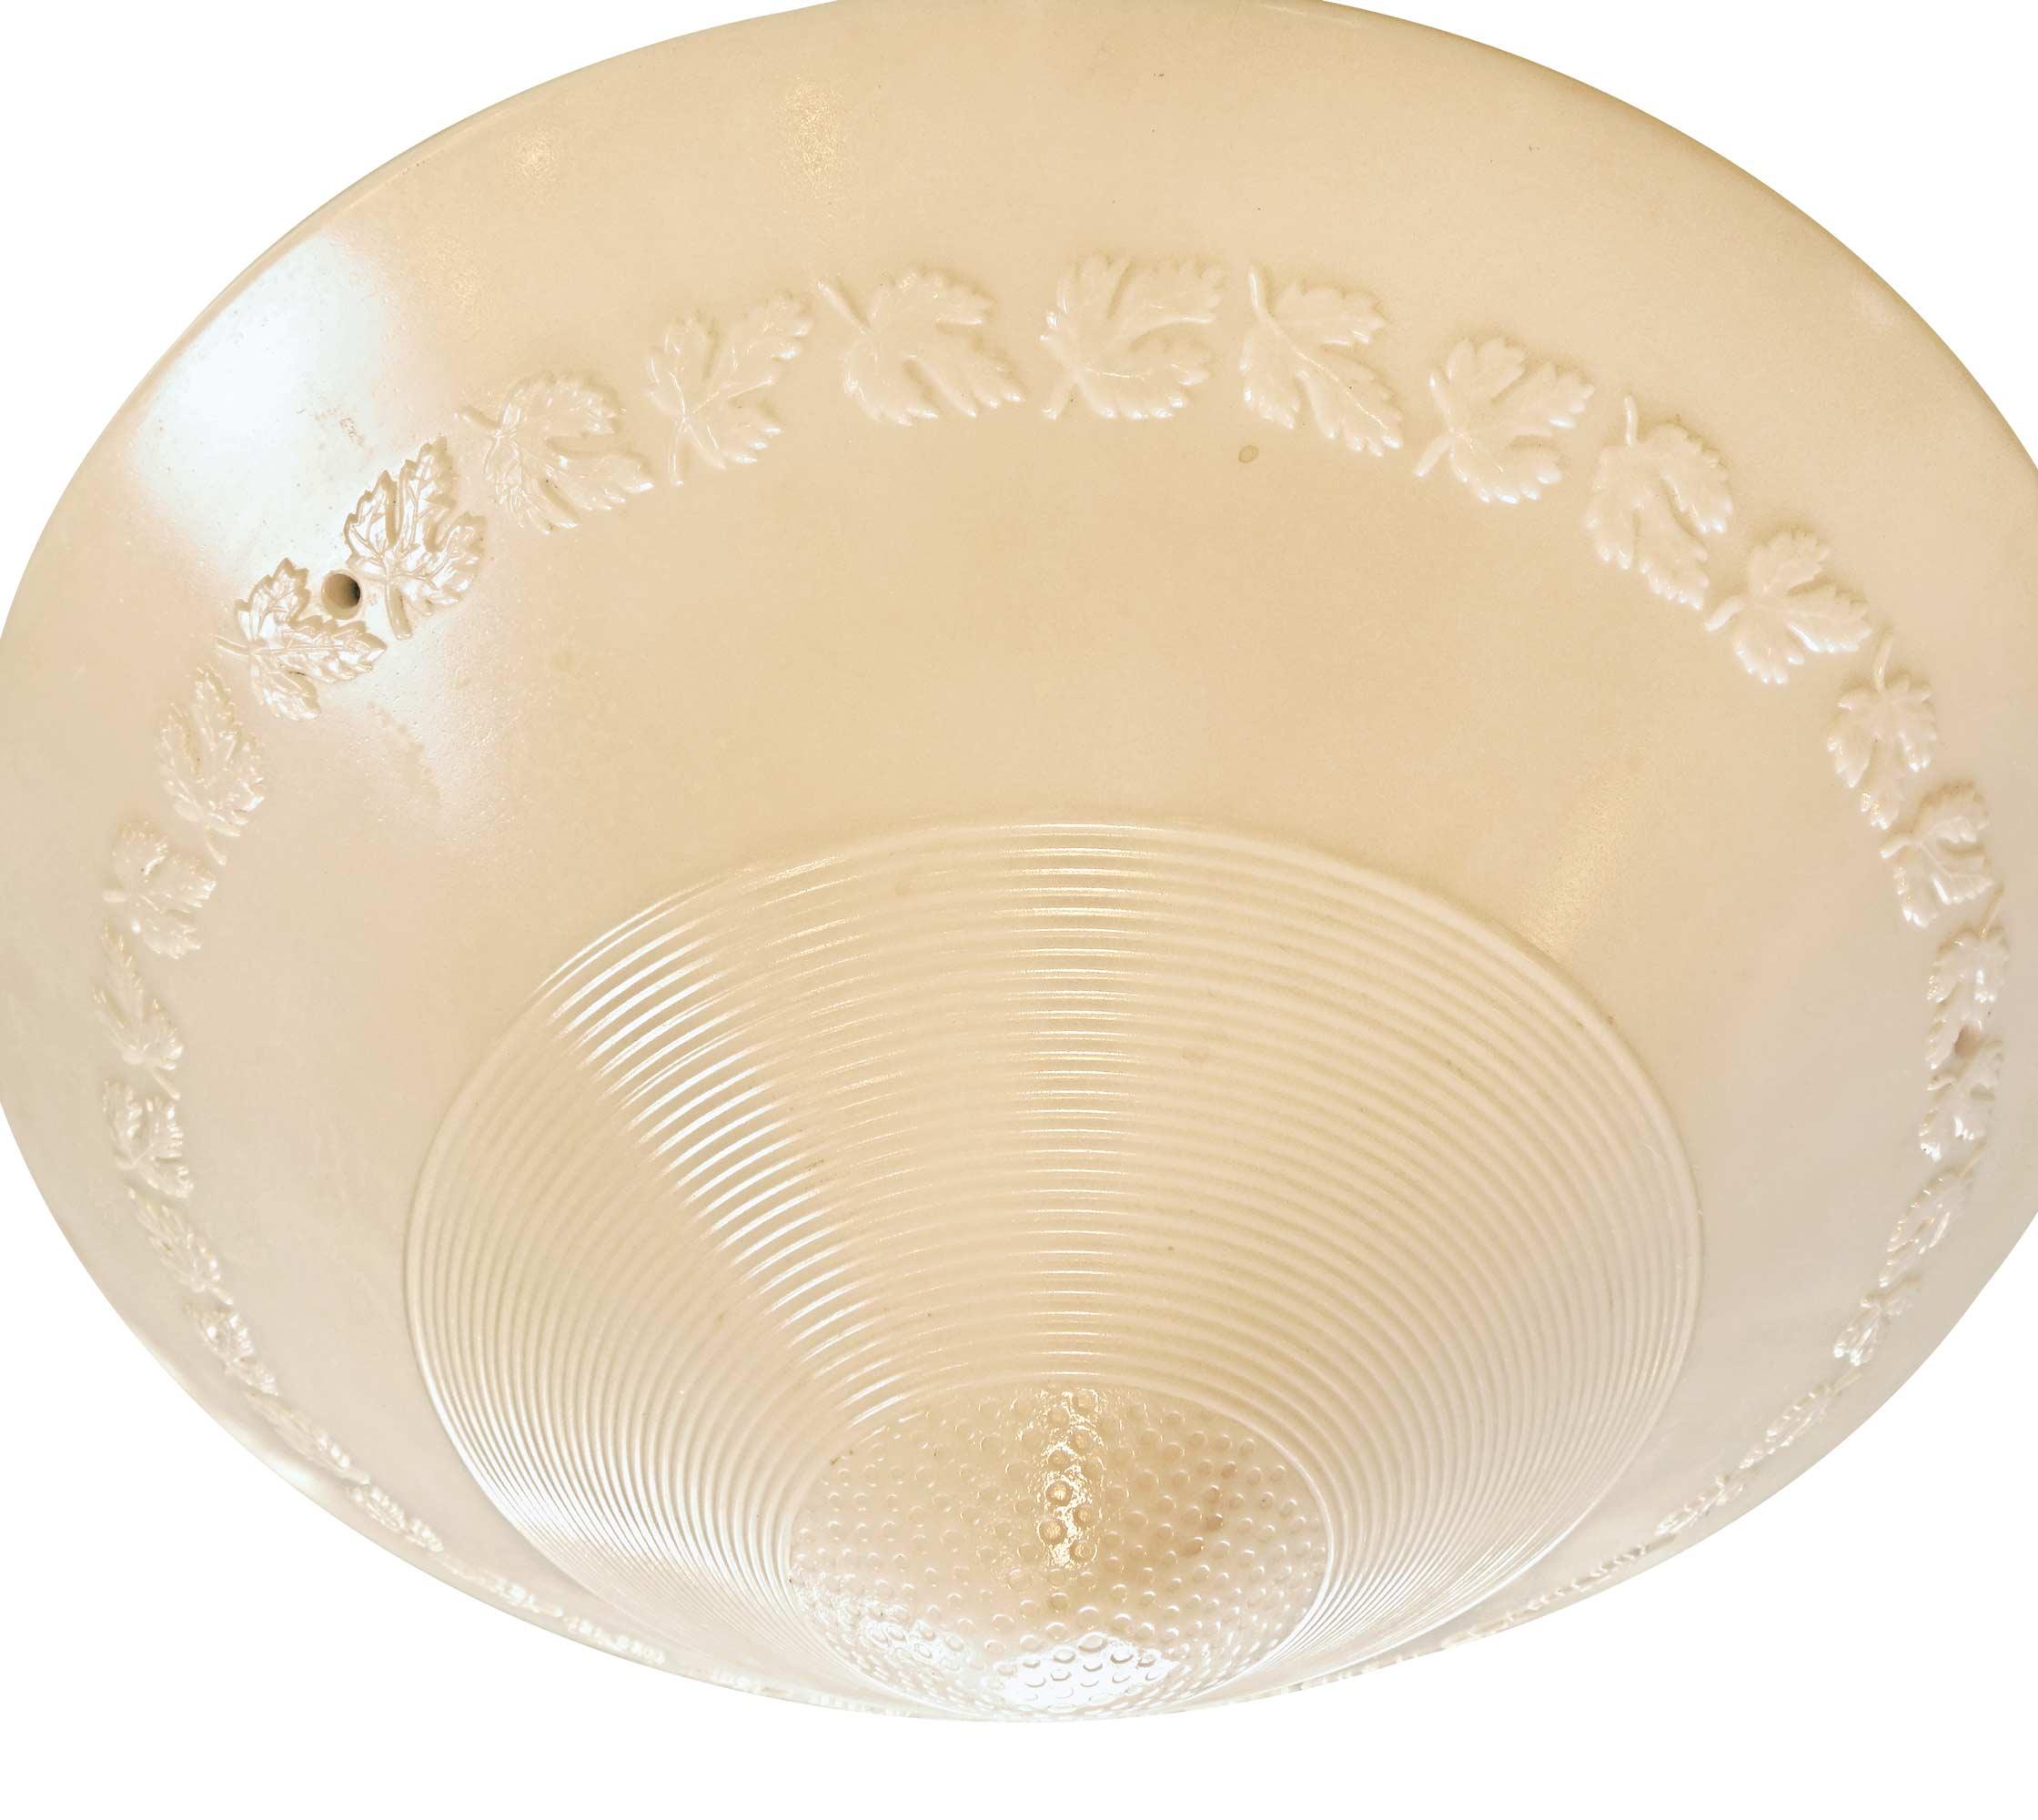 45457-C-art-deco-white-pendant-floral-bowl-cream.jpg